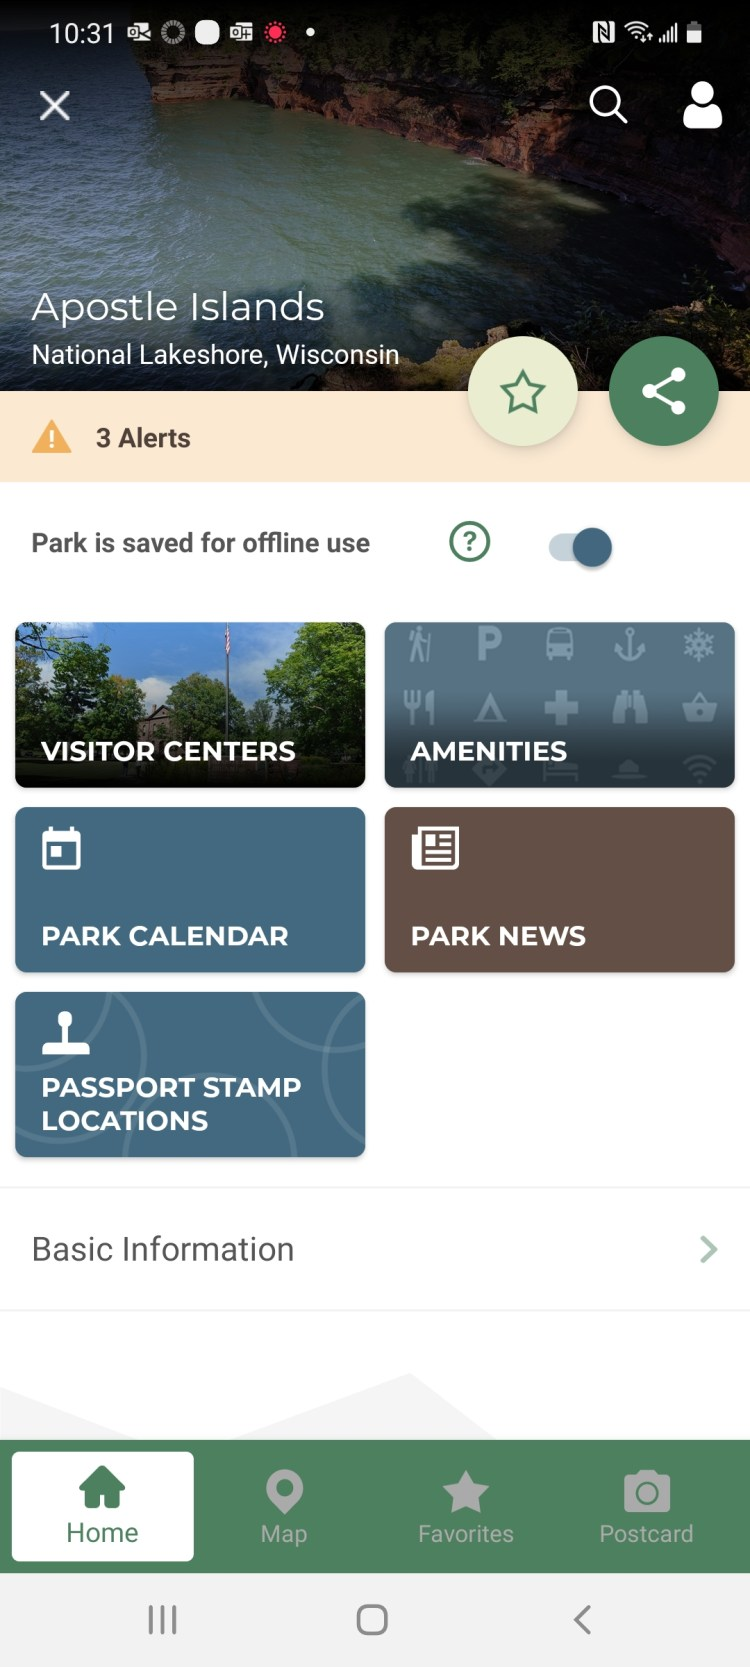 NPS app screen shot: Apostle Islands details